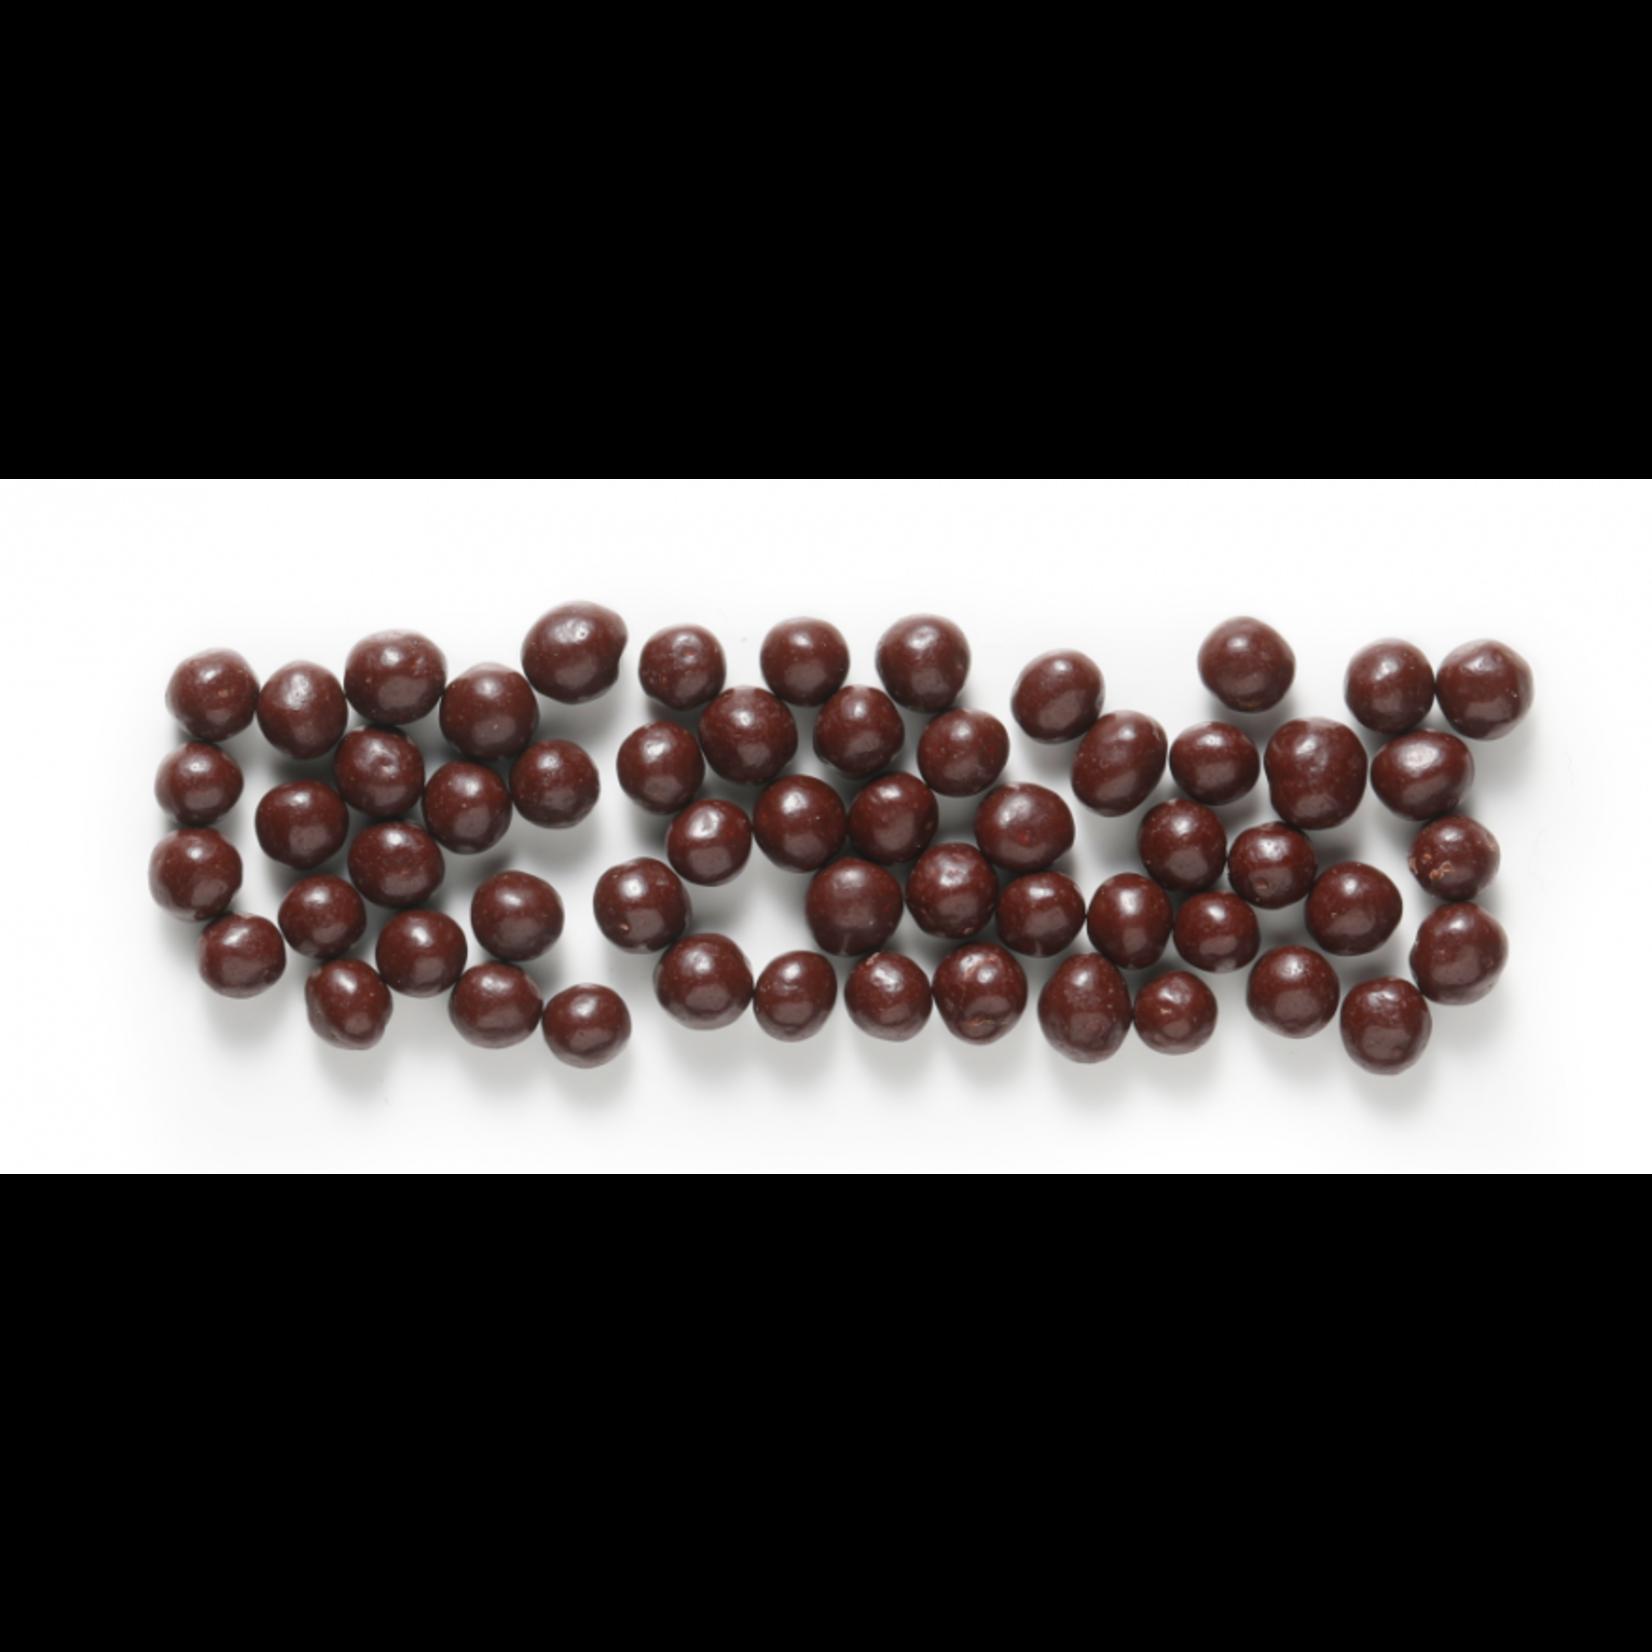 Barry Callebaut Mona Lisa - Dark Chocolate Crispearls - 800g, CHD-CC-D1CRISP-02B